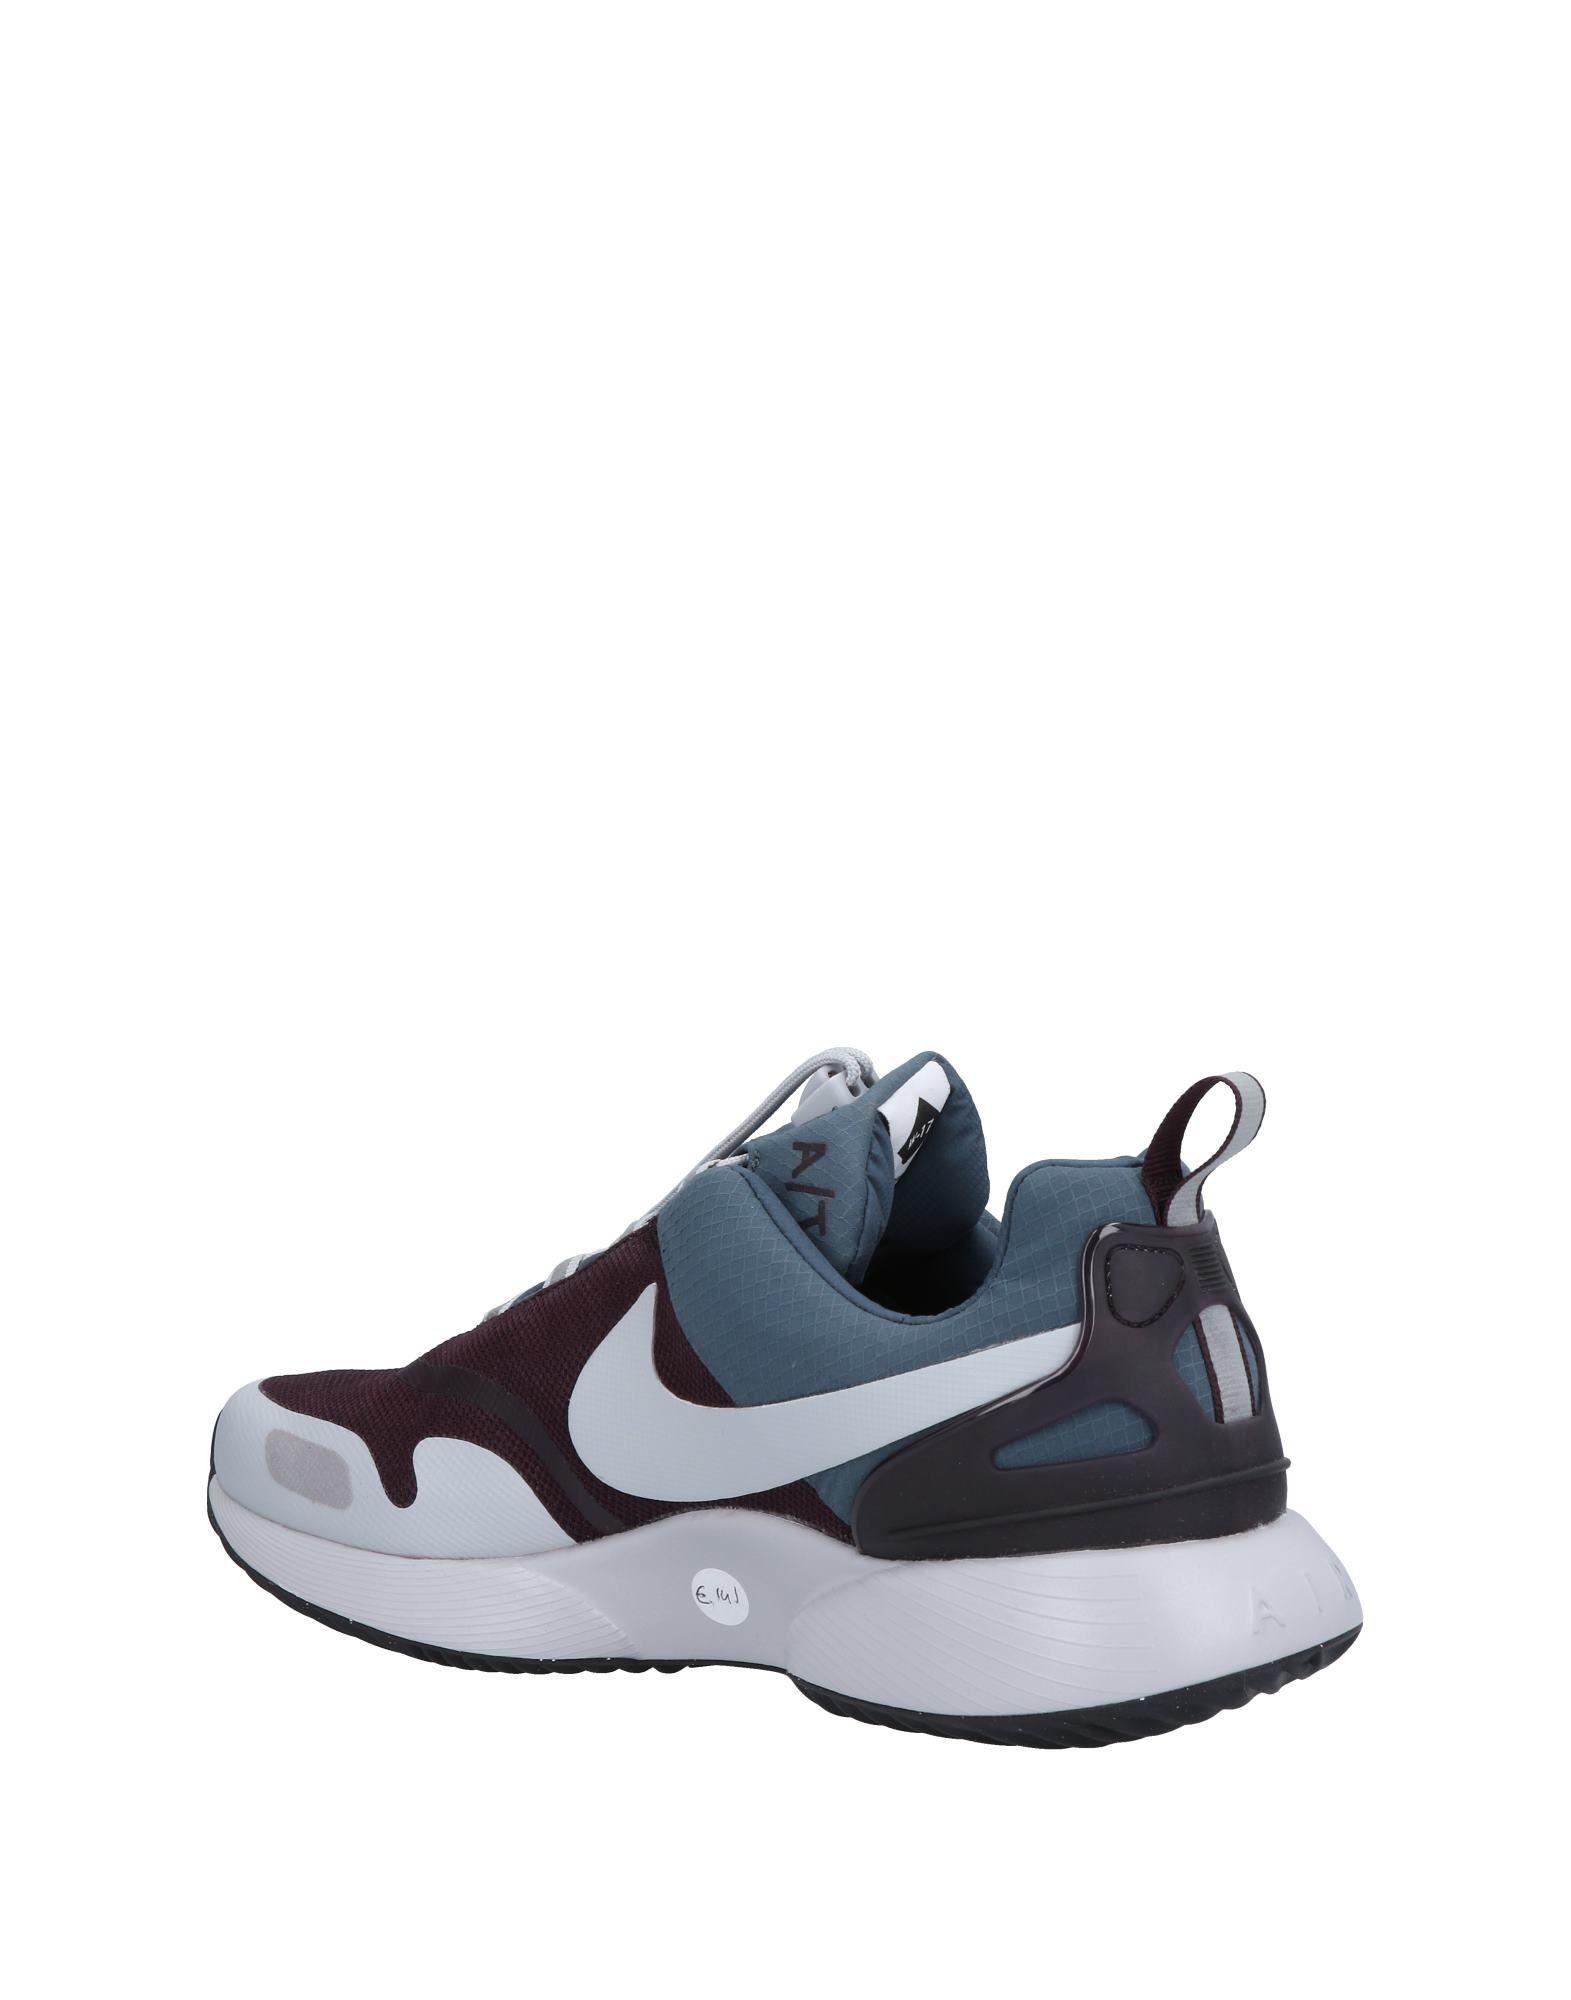 Nike Sneakers - Men Nike Australia Sneakers online on  Australia Nike - 11465842KM 93f089